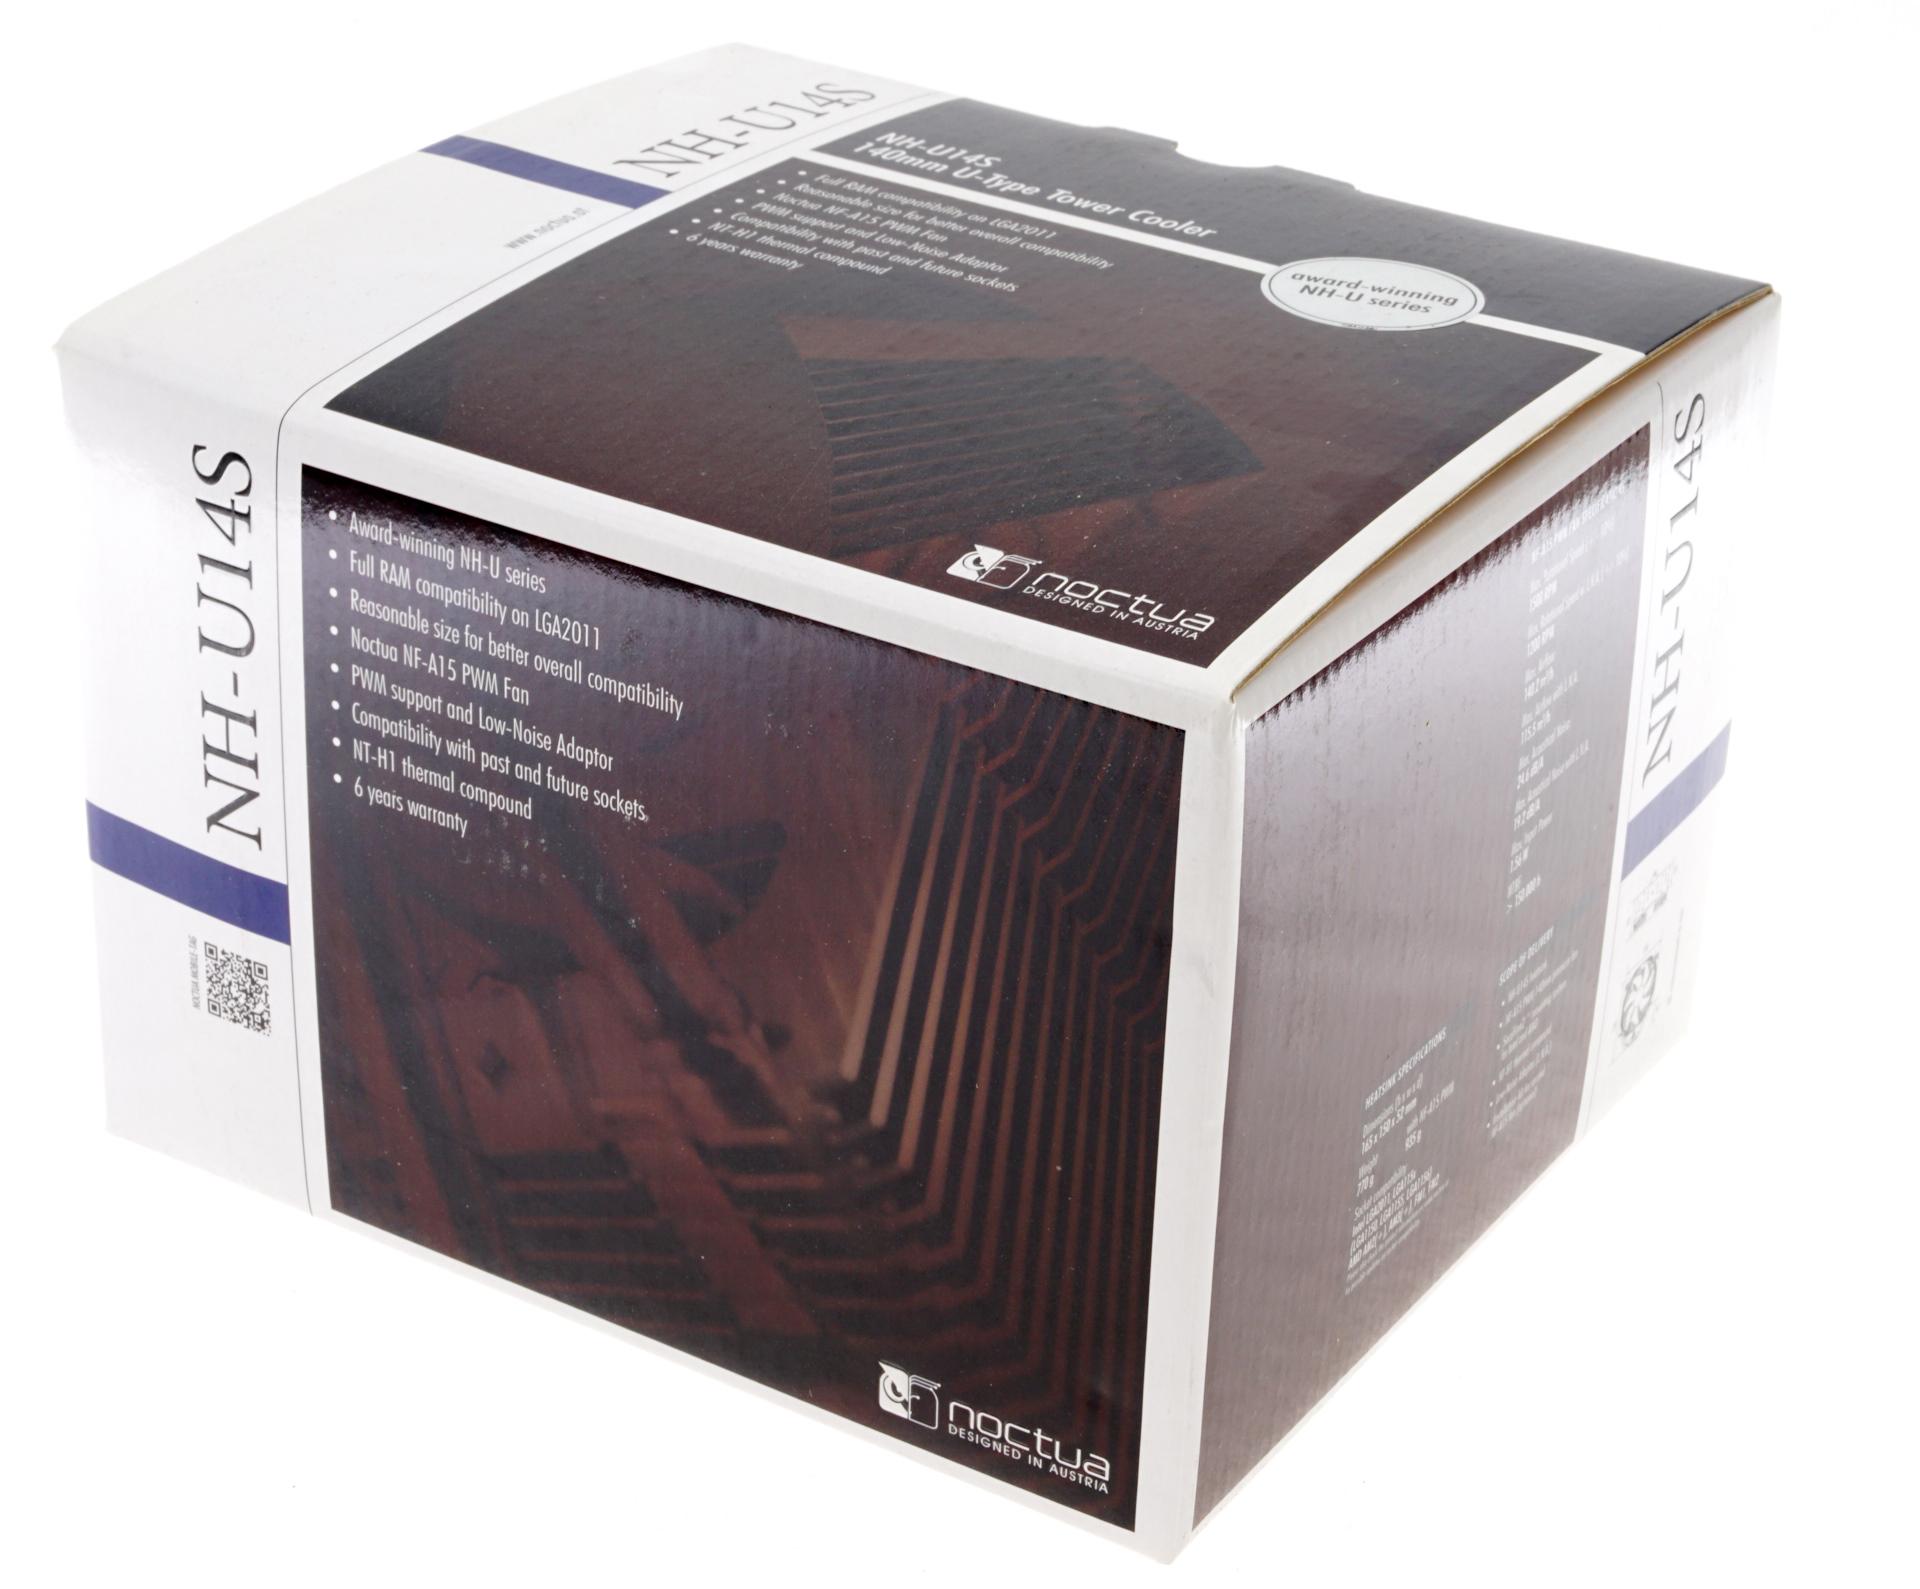 Noctua NH-U14S - The 140mm Slim Tower CPU Cooler Roundup